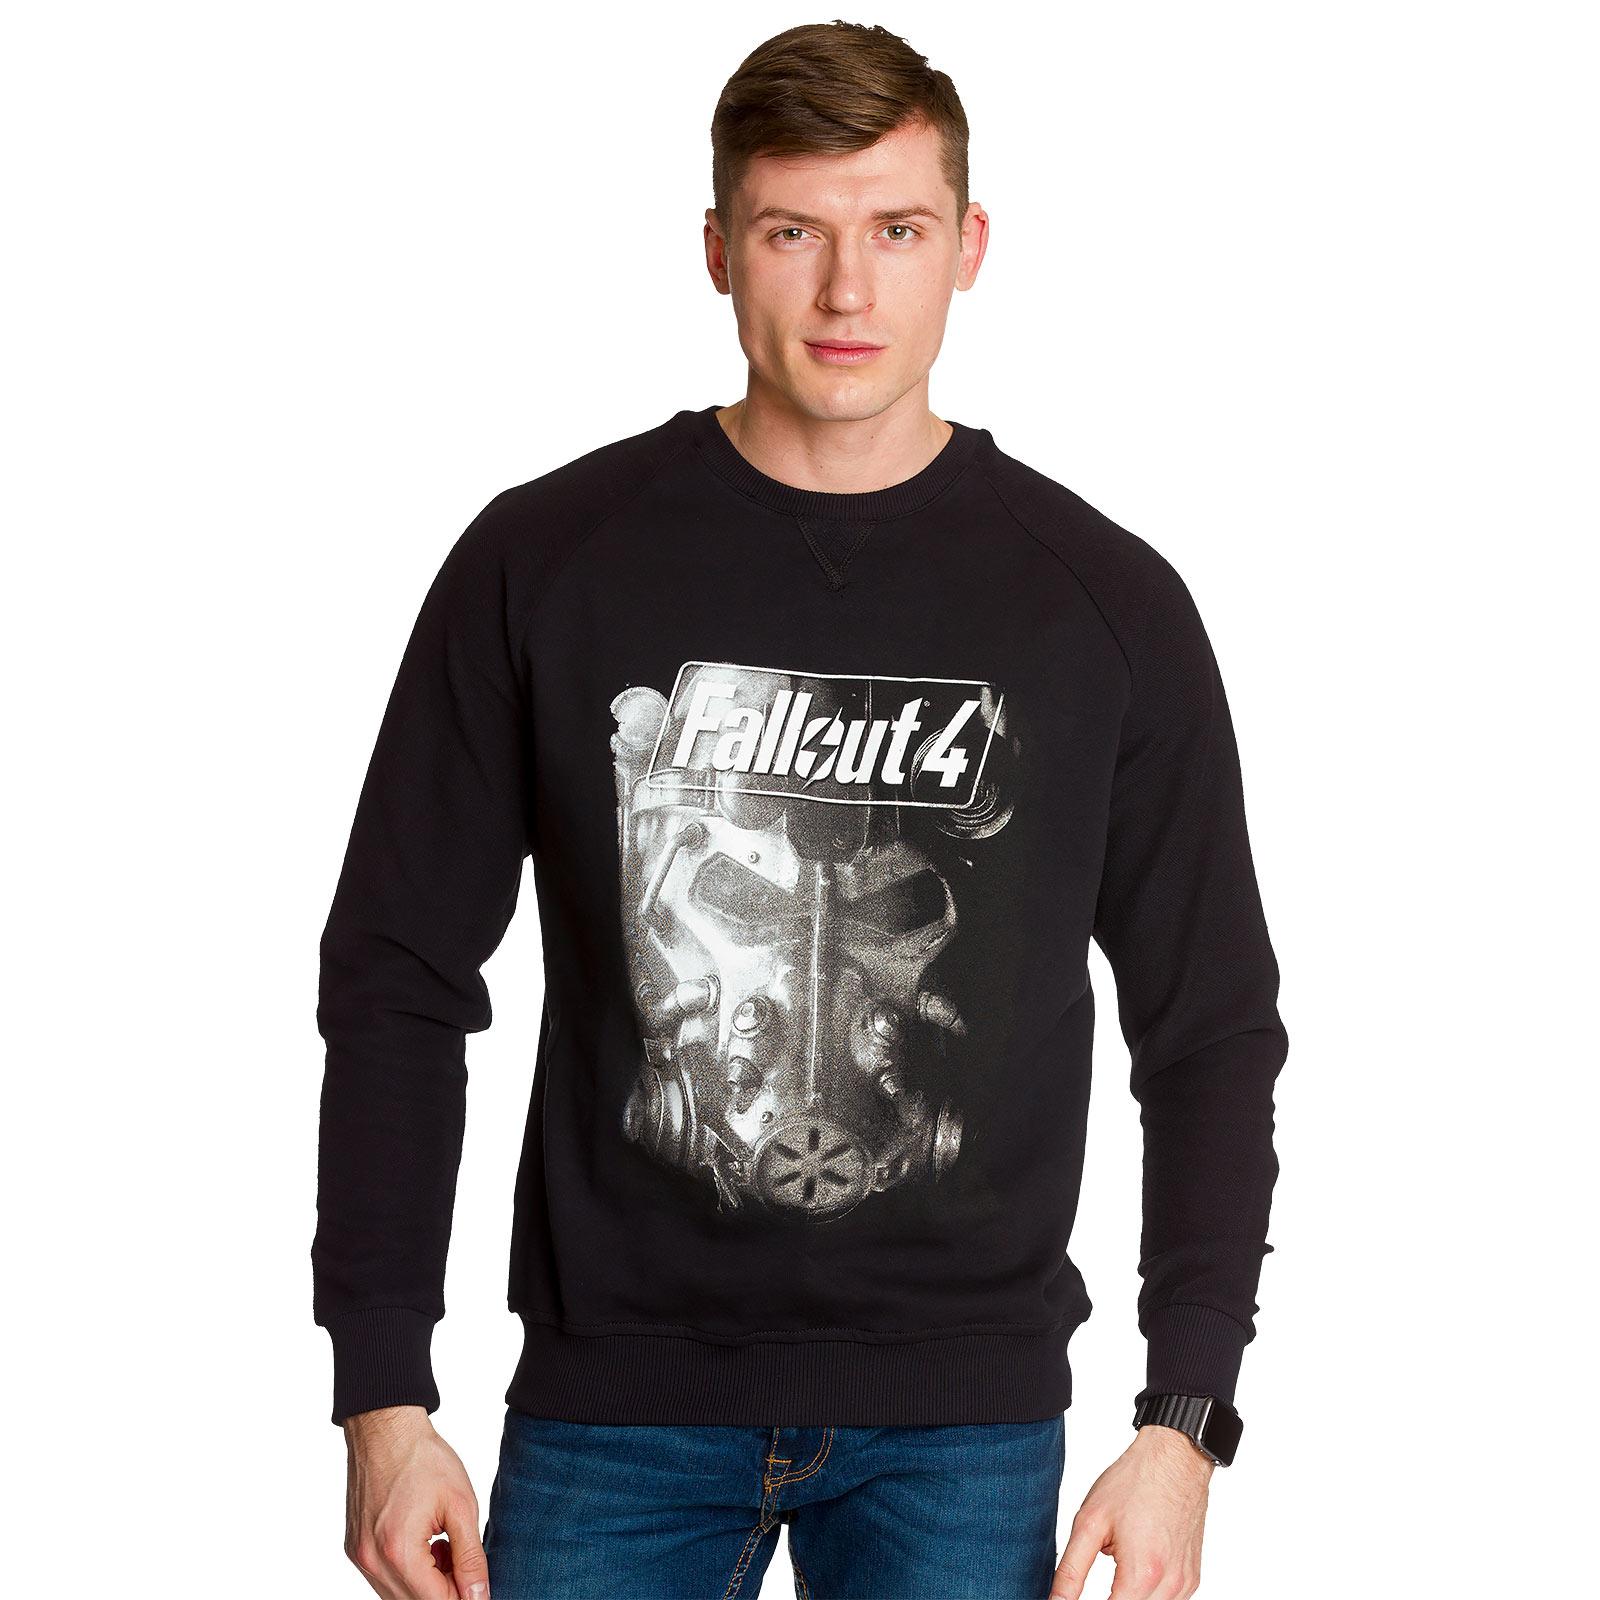 Fallout 4 - Brotherhood of the Steel Sweater schwarz